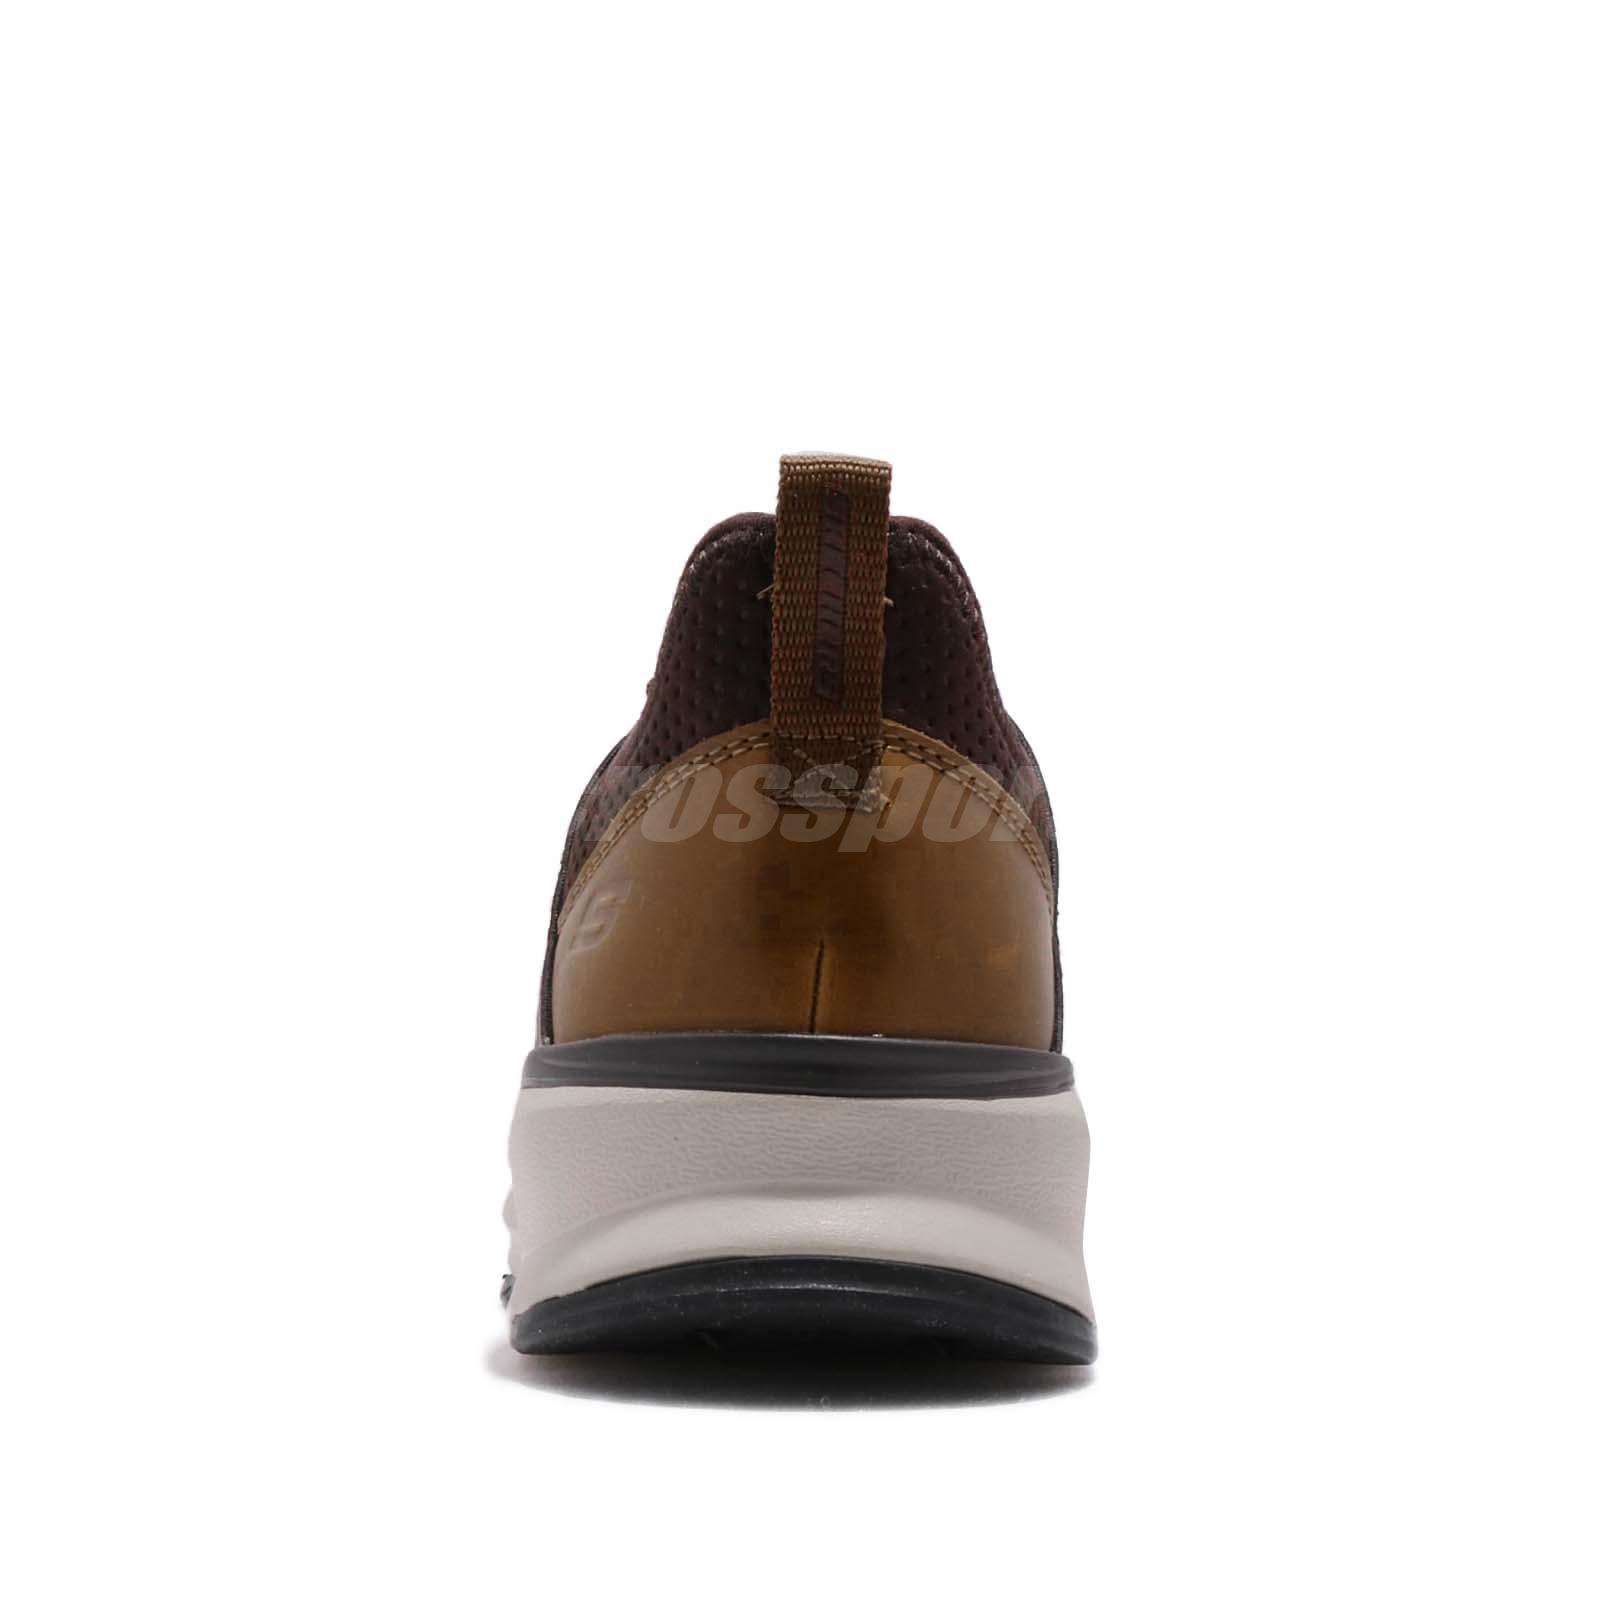 Details about Skechers Relven Hemson Brown Black Men Casual Lifestyle Shoes Sneaker 65732 CHOC